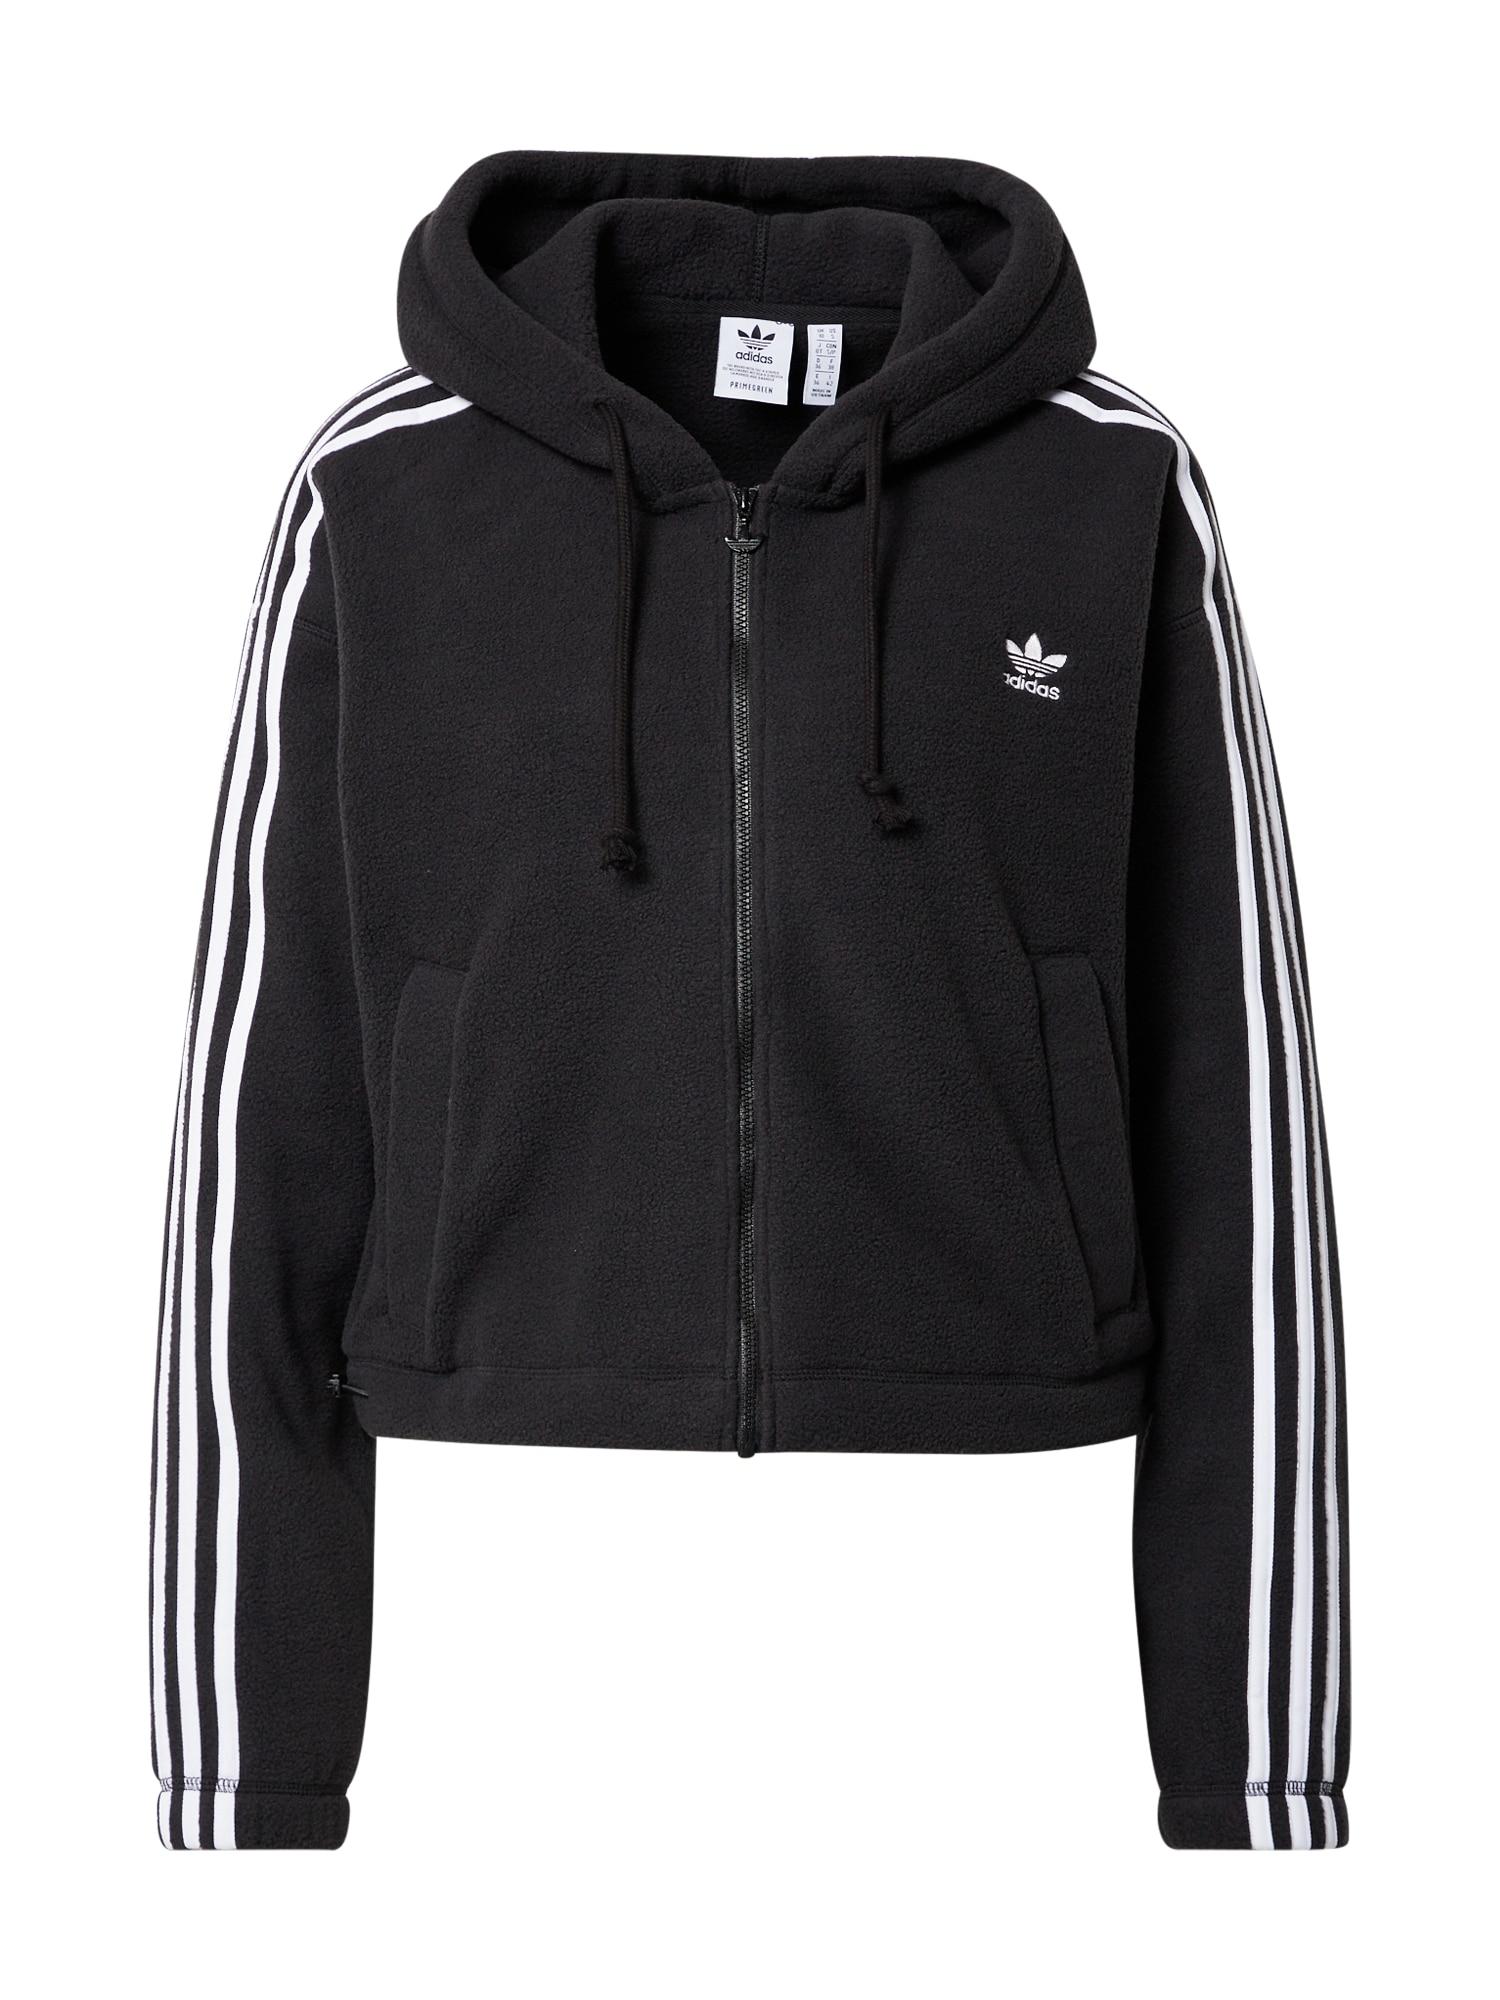 ADIDAS ORIGINALS Flisinis džemperis juoda / balta